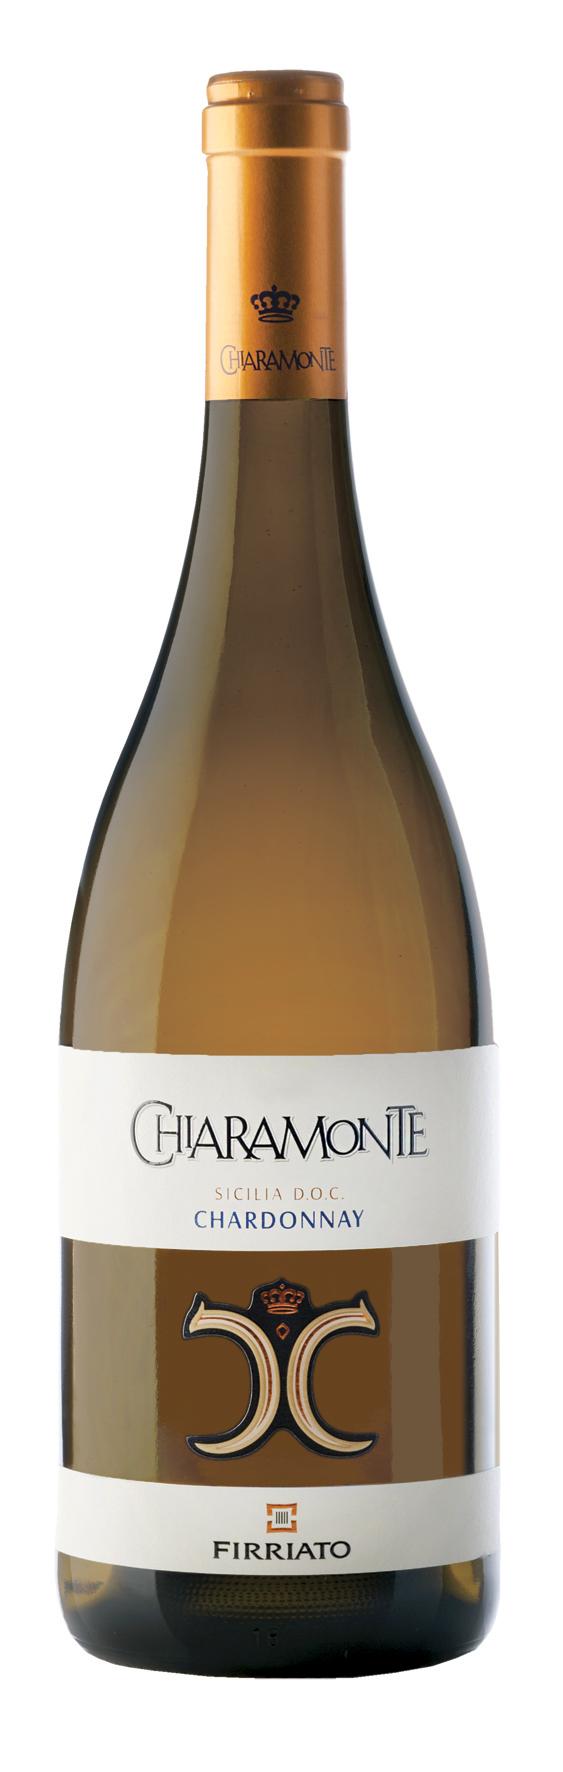 firriato_Chiaramonte_Chardonnay